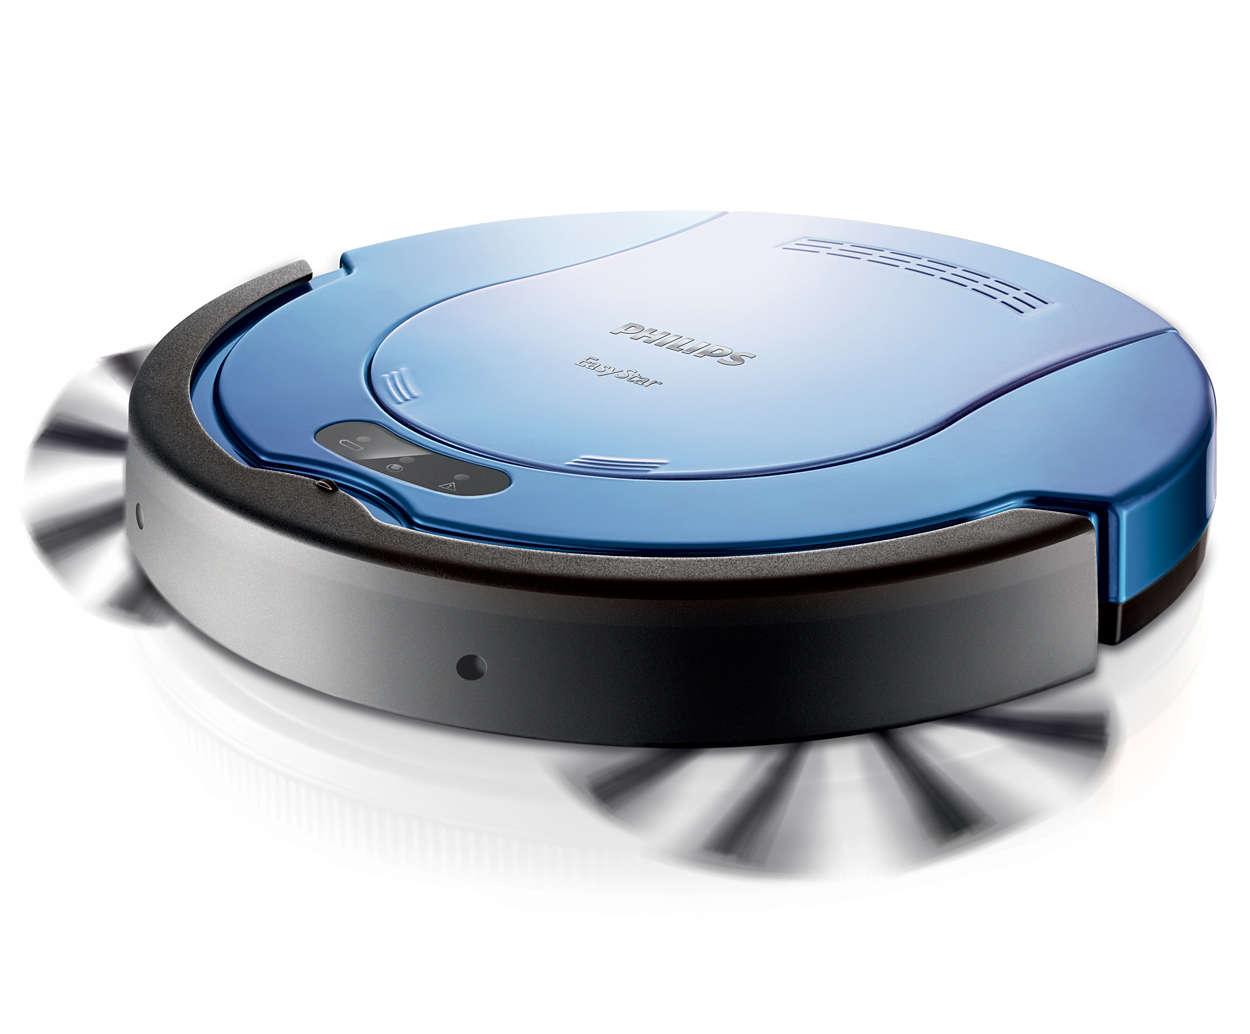 The slimmest robot vacuum cleaner